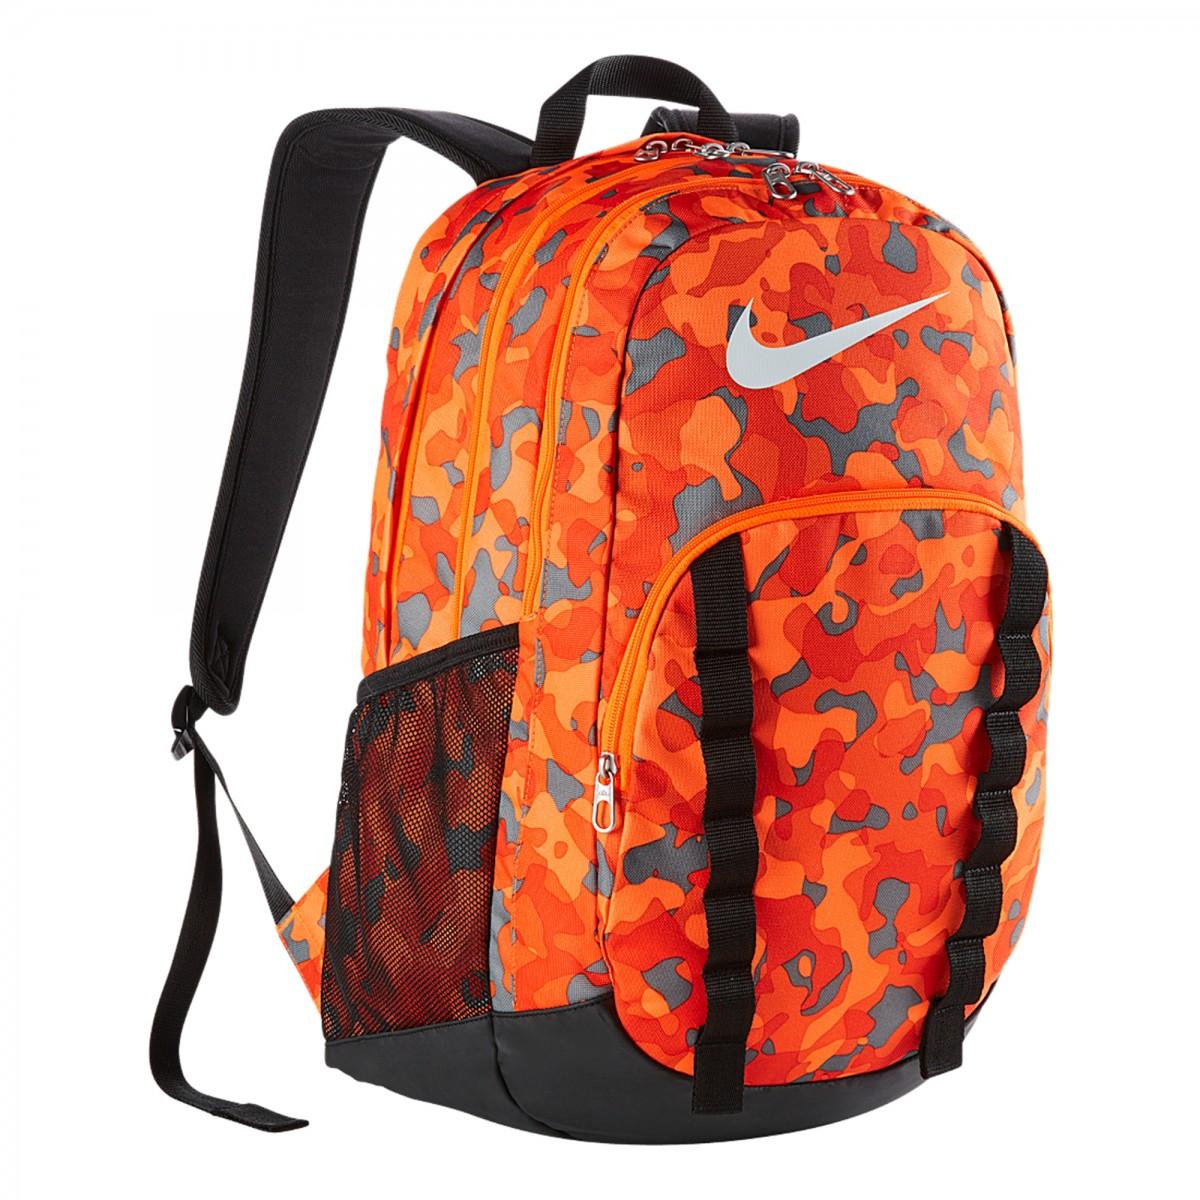 Mochila Nike Brasilia 7 Backpack Graphic Lar / pto Un